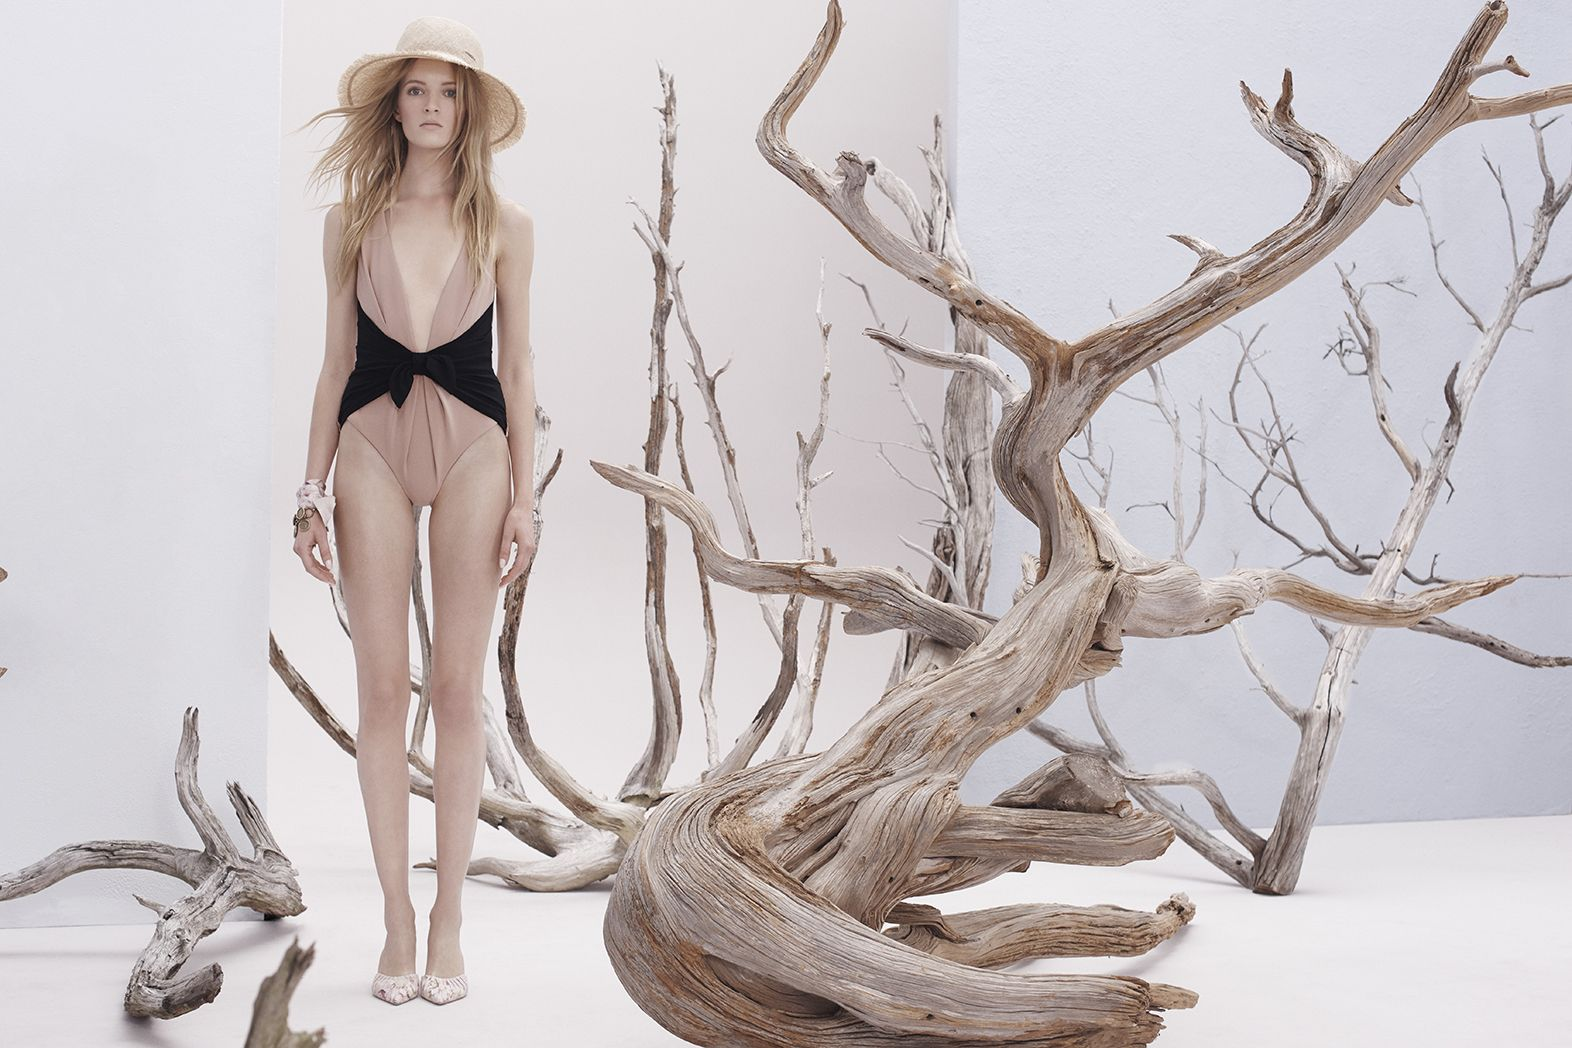 ZIMMERMANN Resort Ready-to-Wear 17 Collection | Zimmermann Designer Resort wear | Women Swimwear